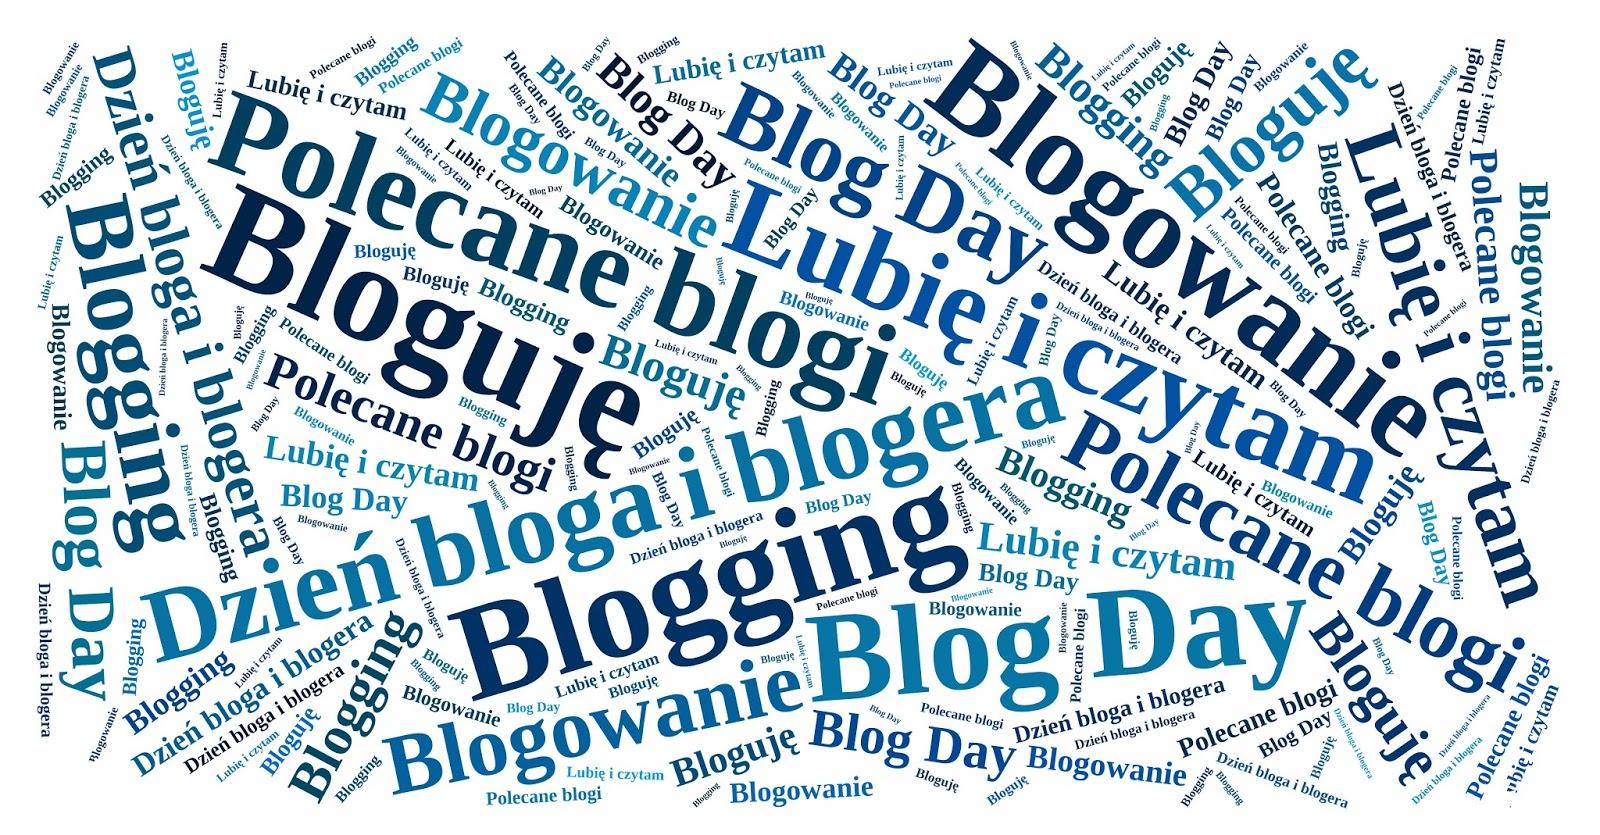 Blog Day 2014 - Dzień blogera